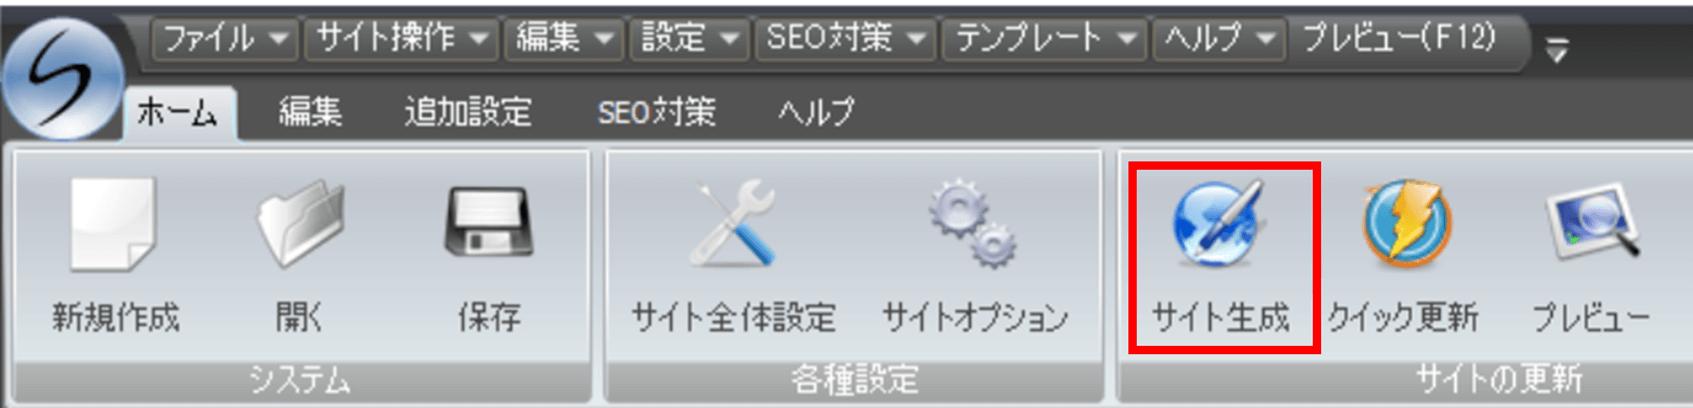 SIRIUS サイト生成